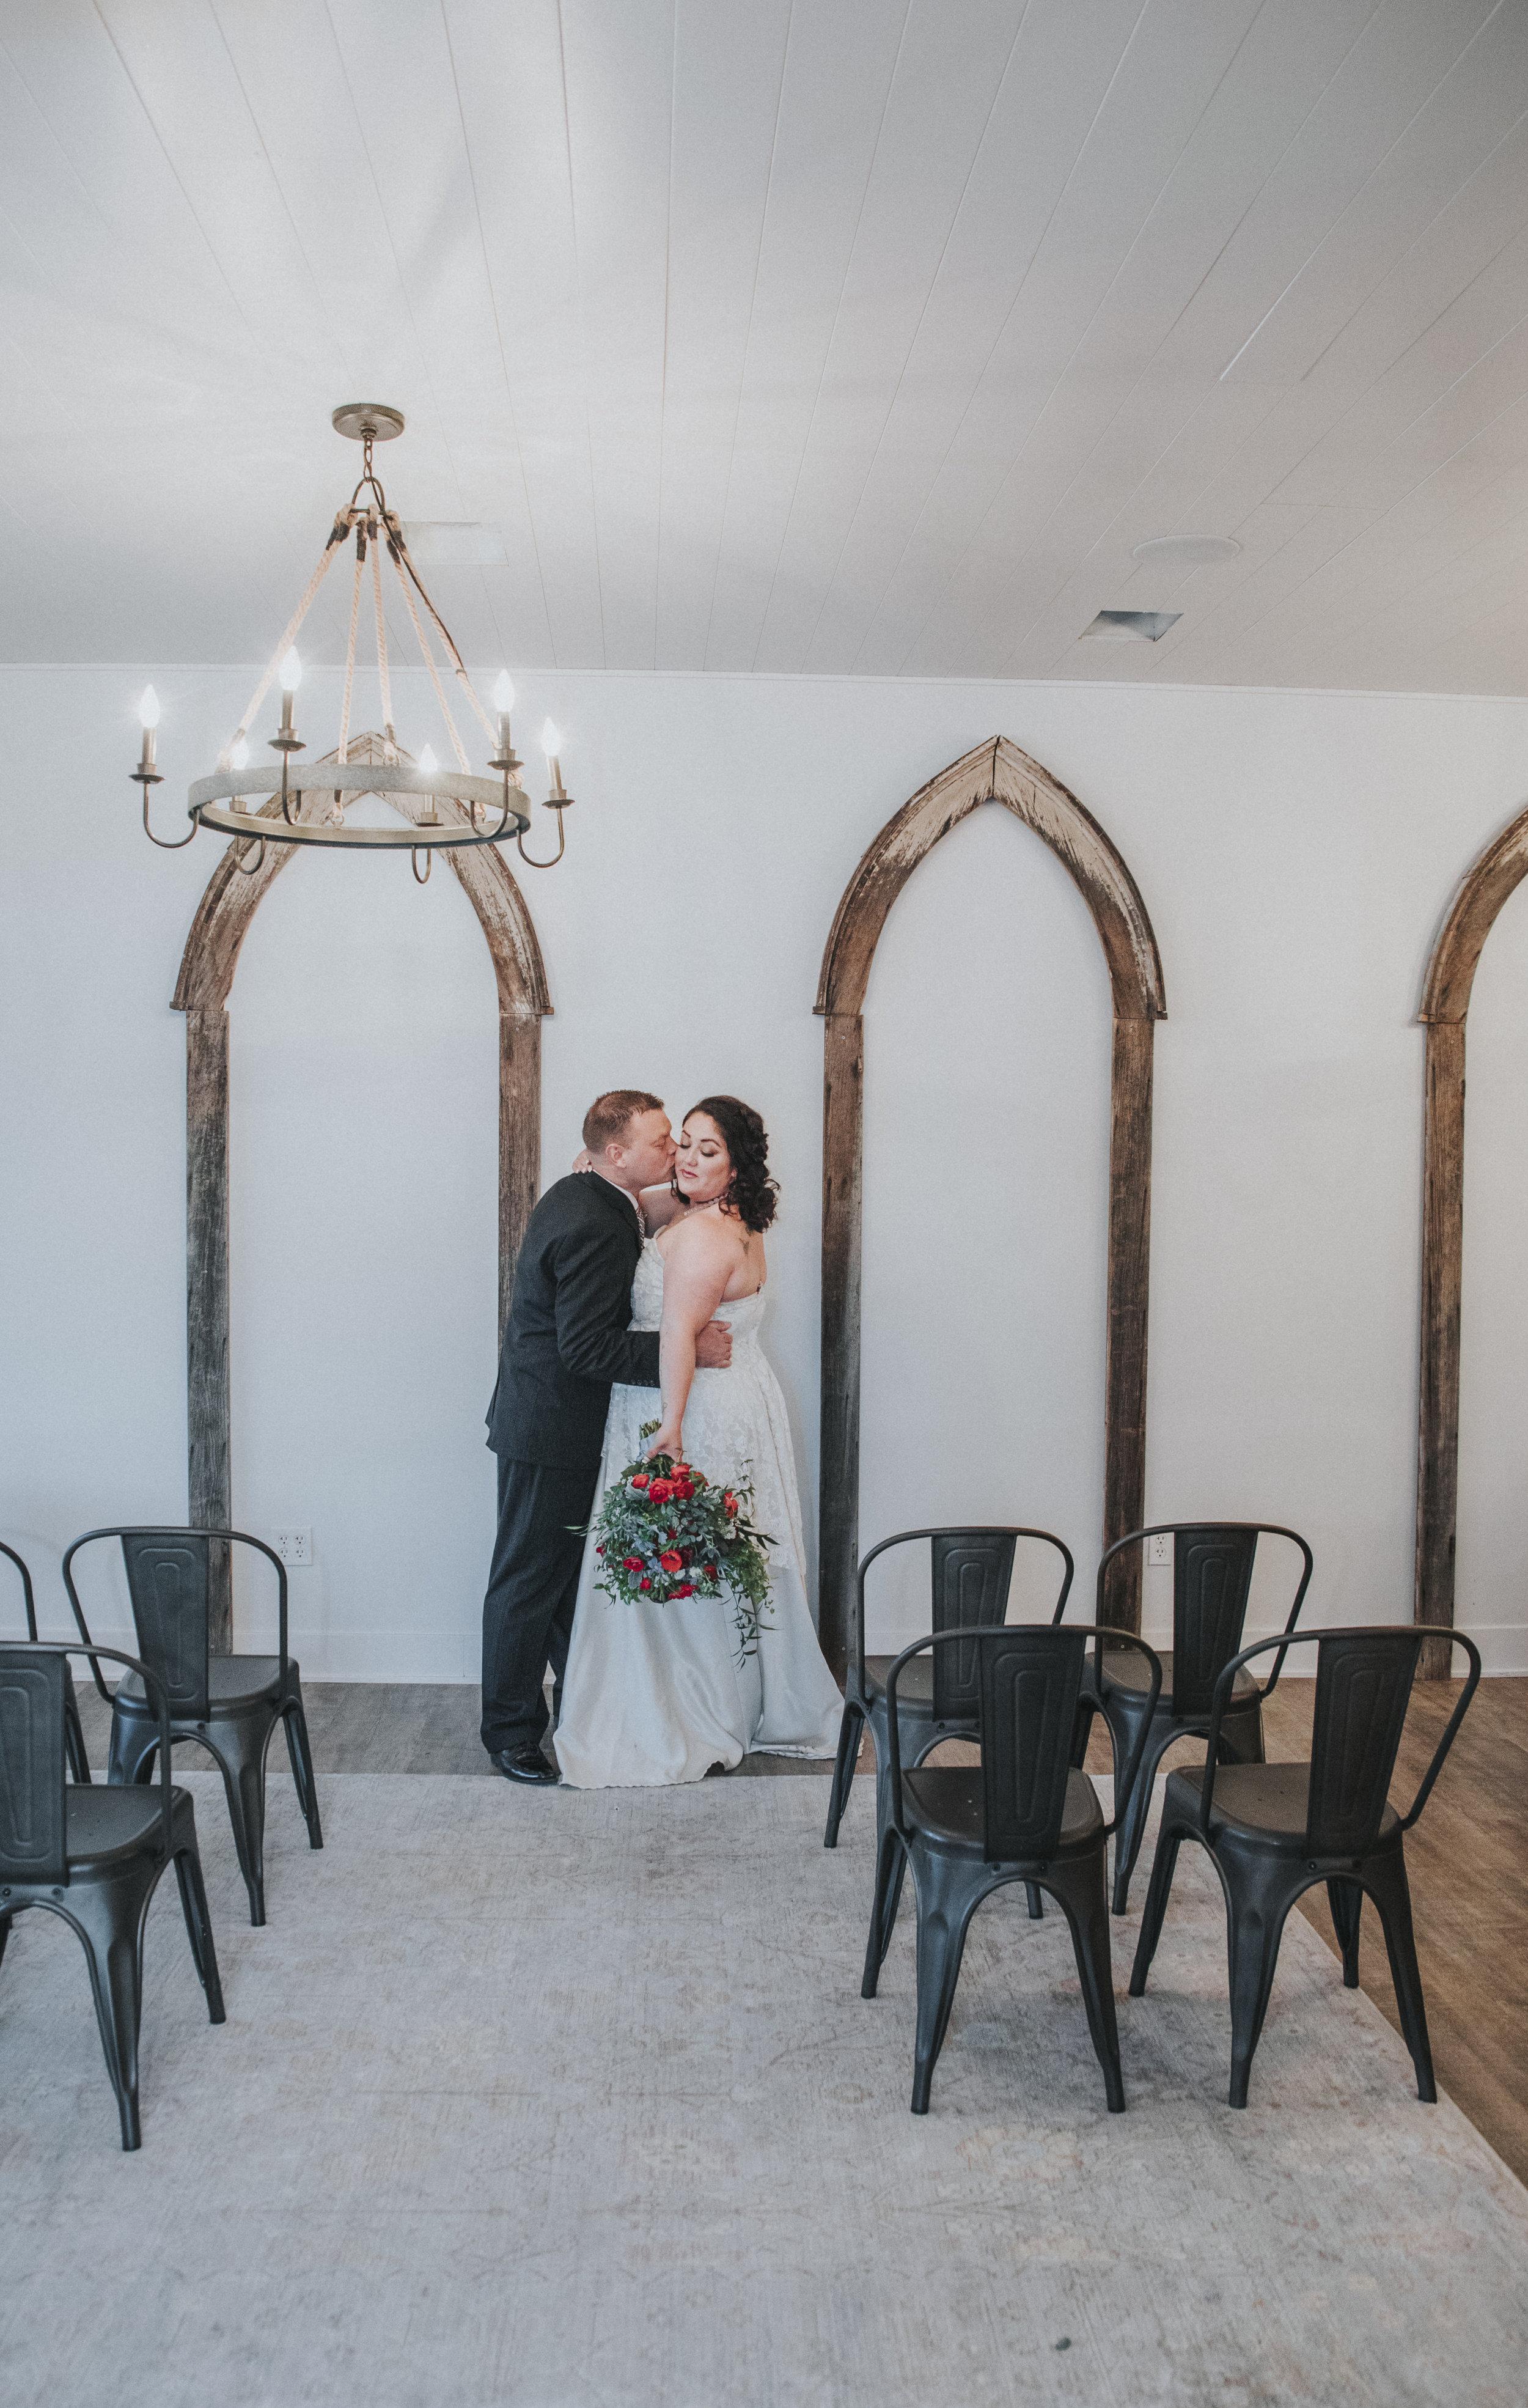 98 midwest-colorado-nebraska-elopement-photography-gretna-turtledoves.jpg